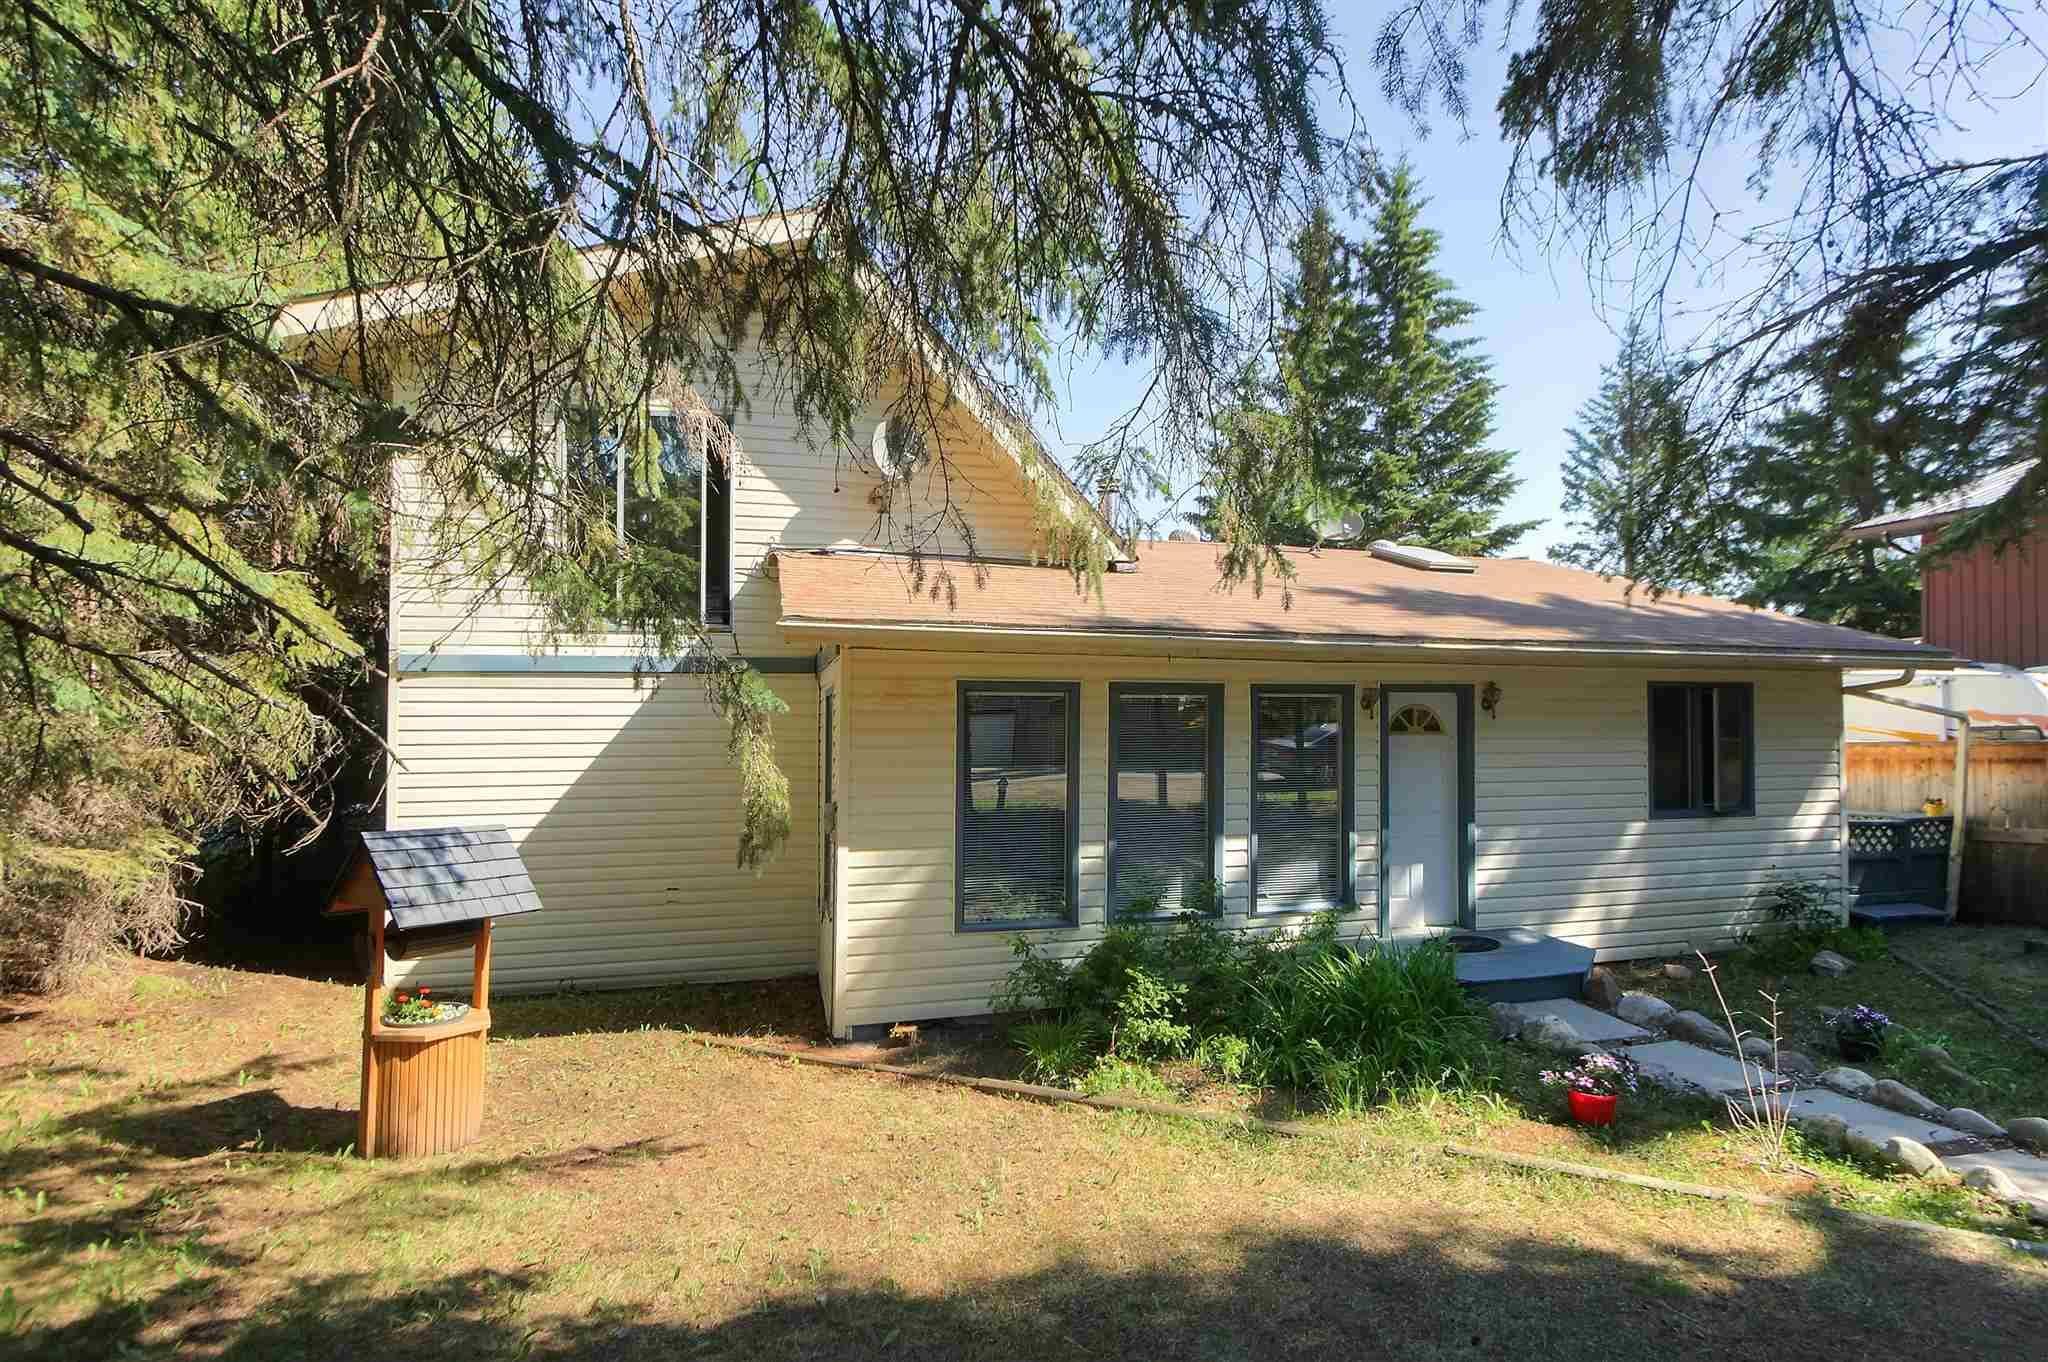 Main Photo: 1510 Marine Crescent: Rural Lac Ste. Anne County House for sale : MLS®# E4261441